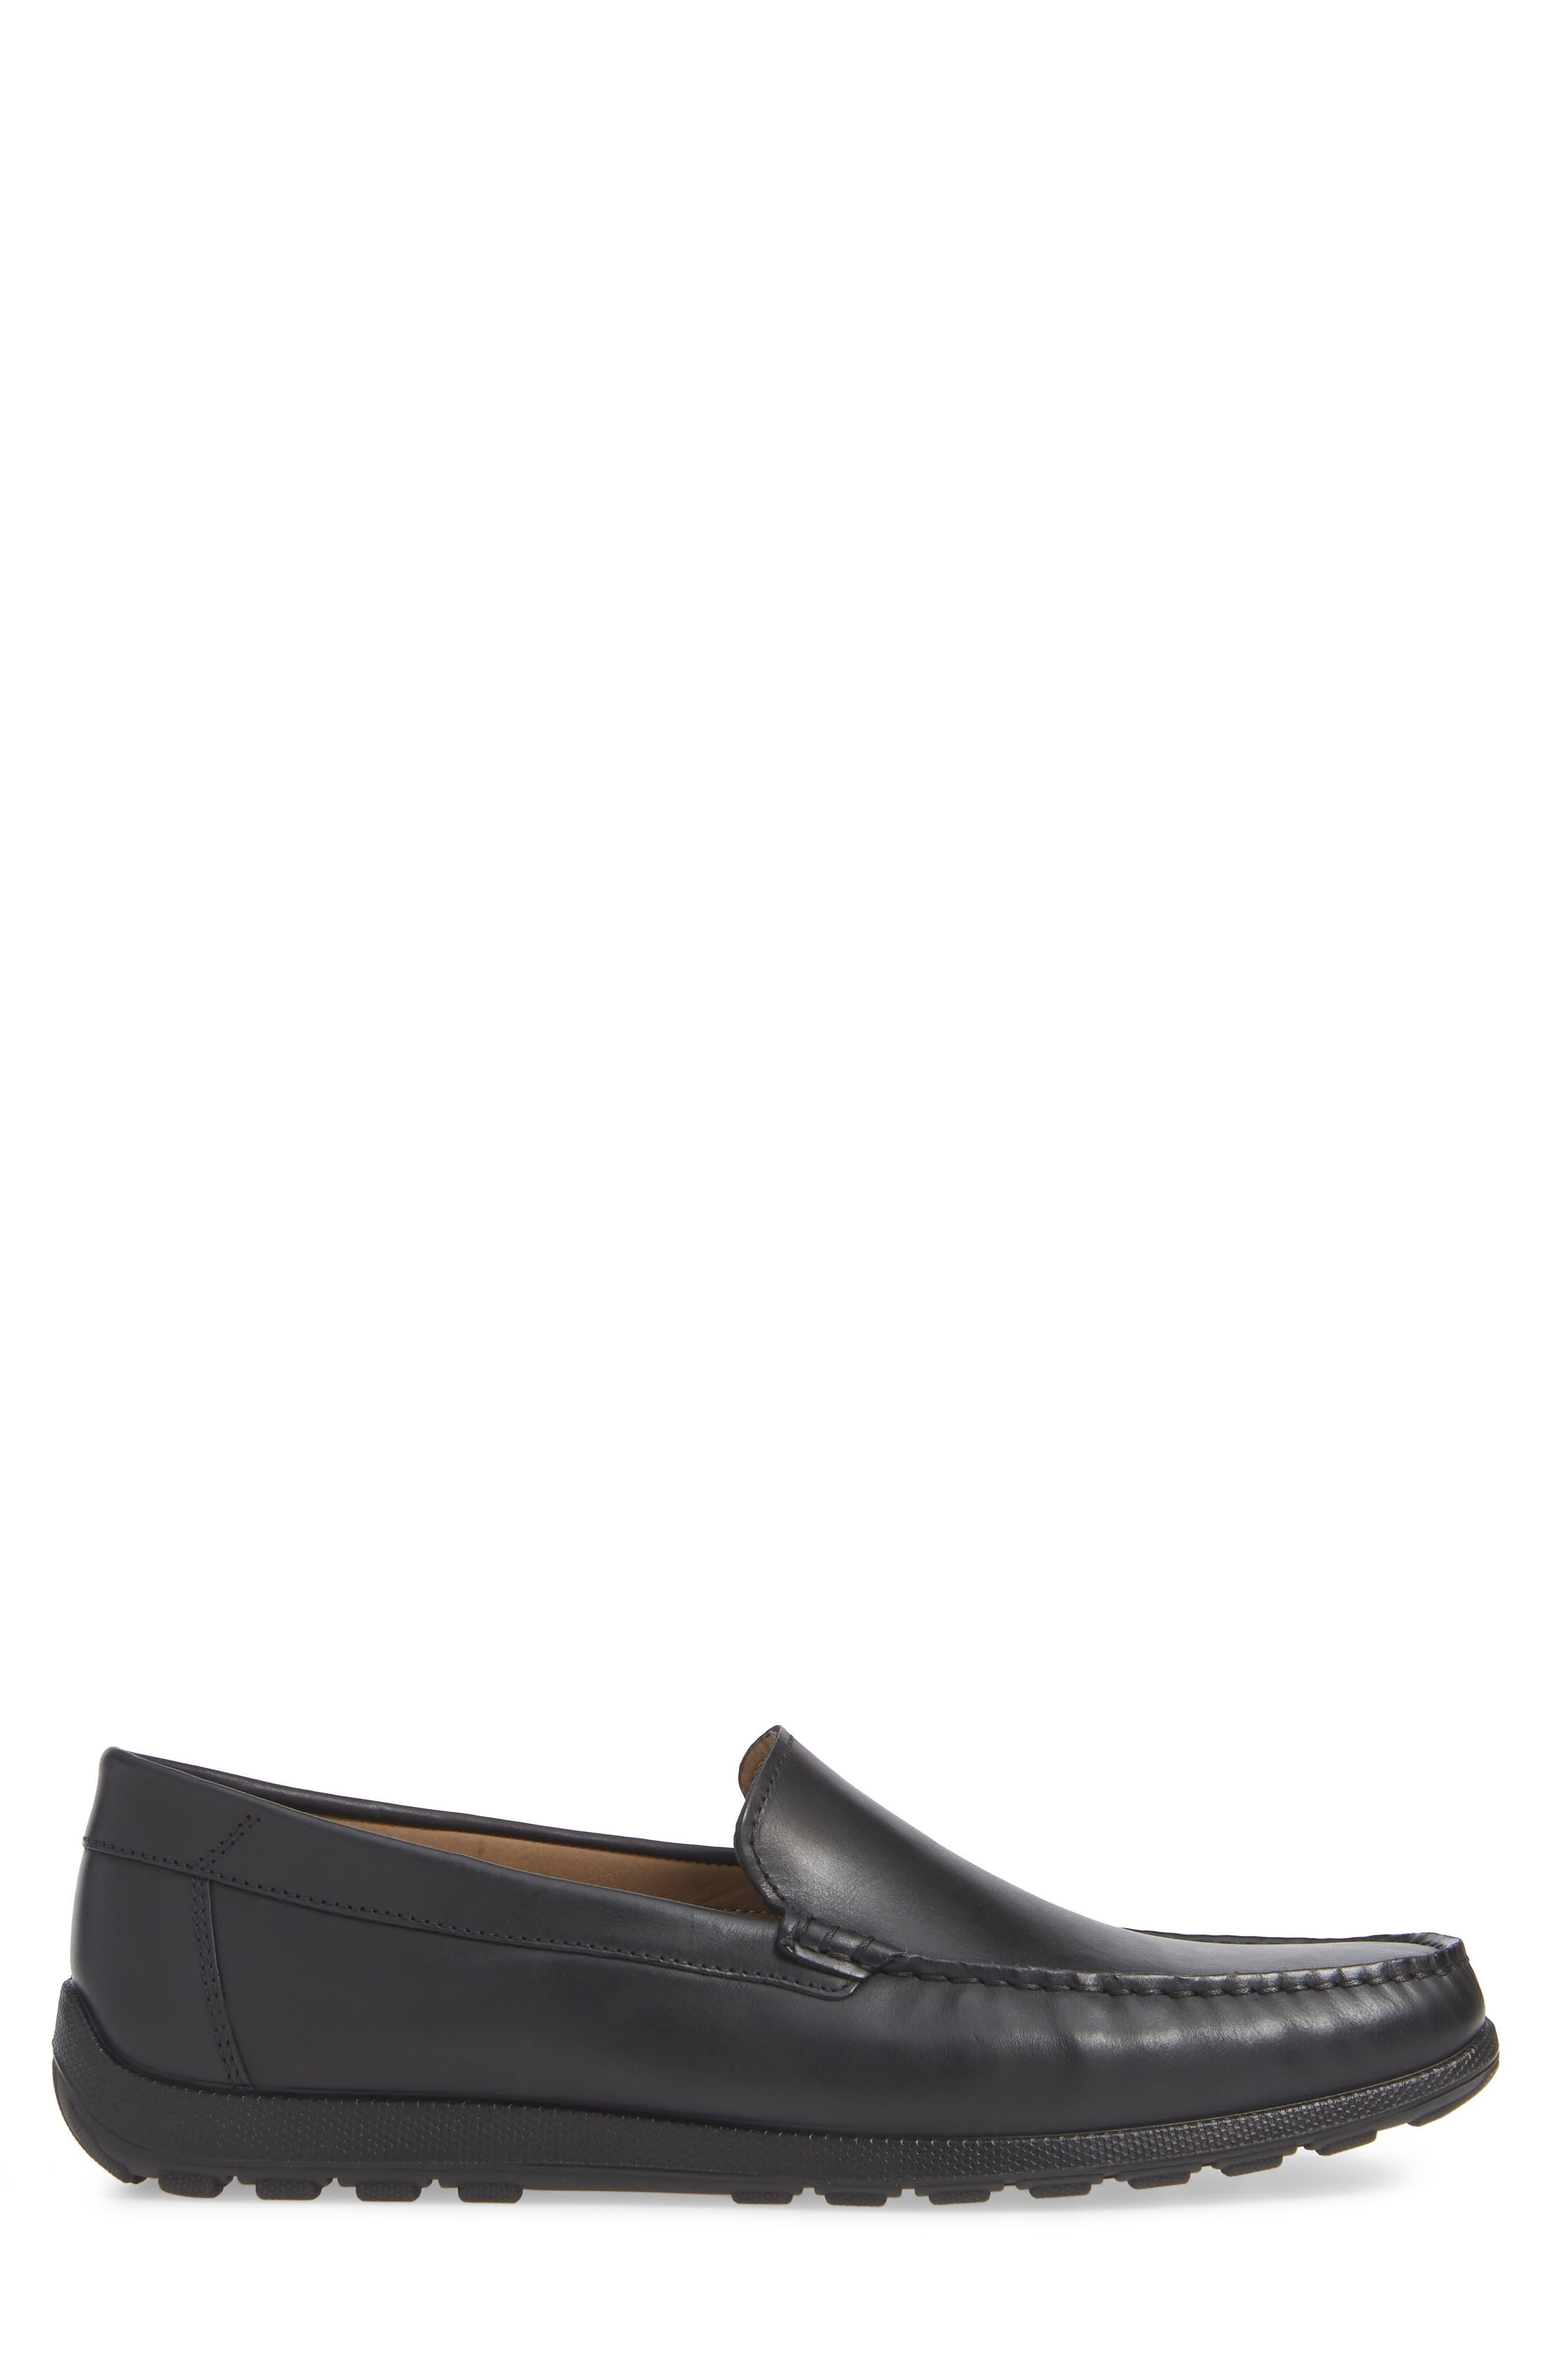 Dip Moc Toe Driving Loafer,                             Alternate thumbnail 3, color,                             BLACK LEATHER